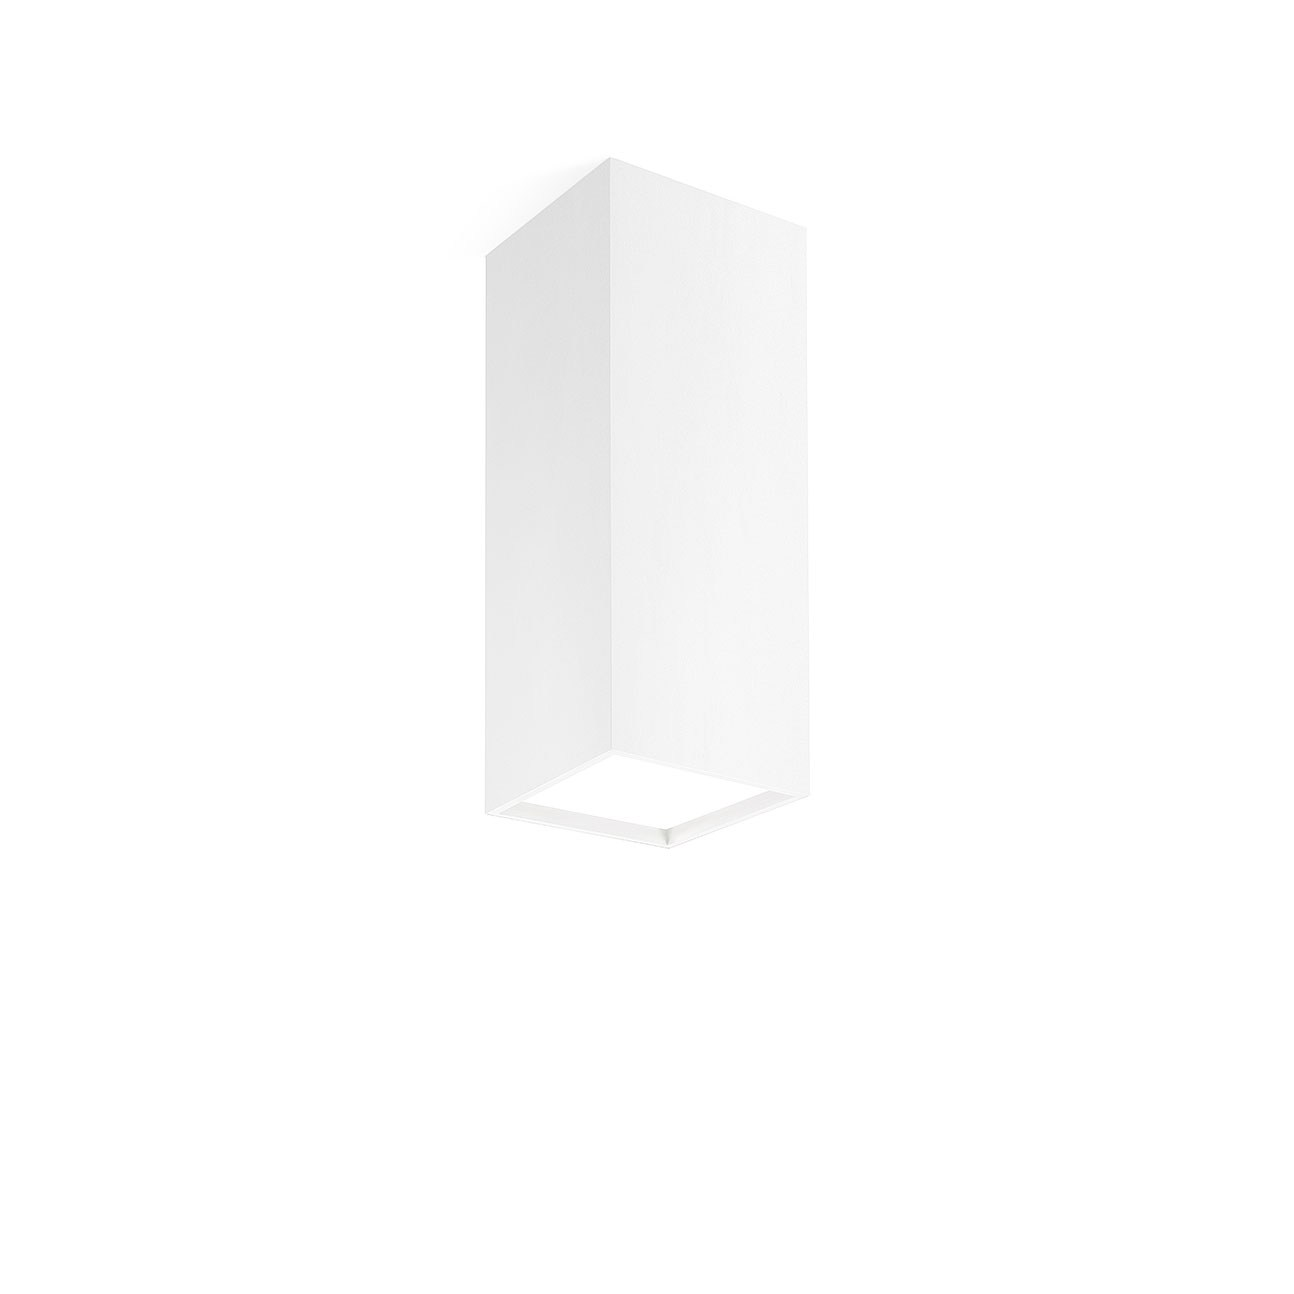 Lampada da soffitto a LED a luce diretta TRYBECA SURFACE SQUARE by Reggiani Illuminazione design ...